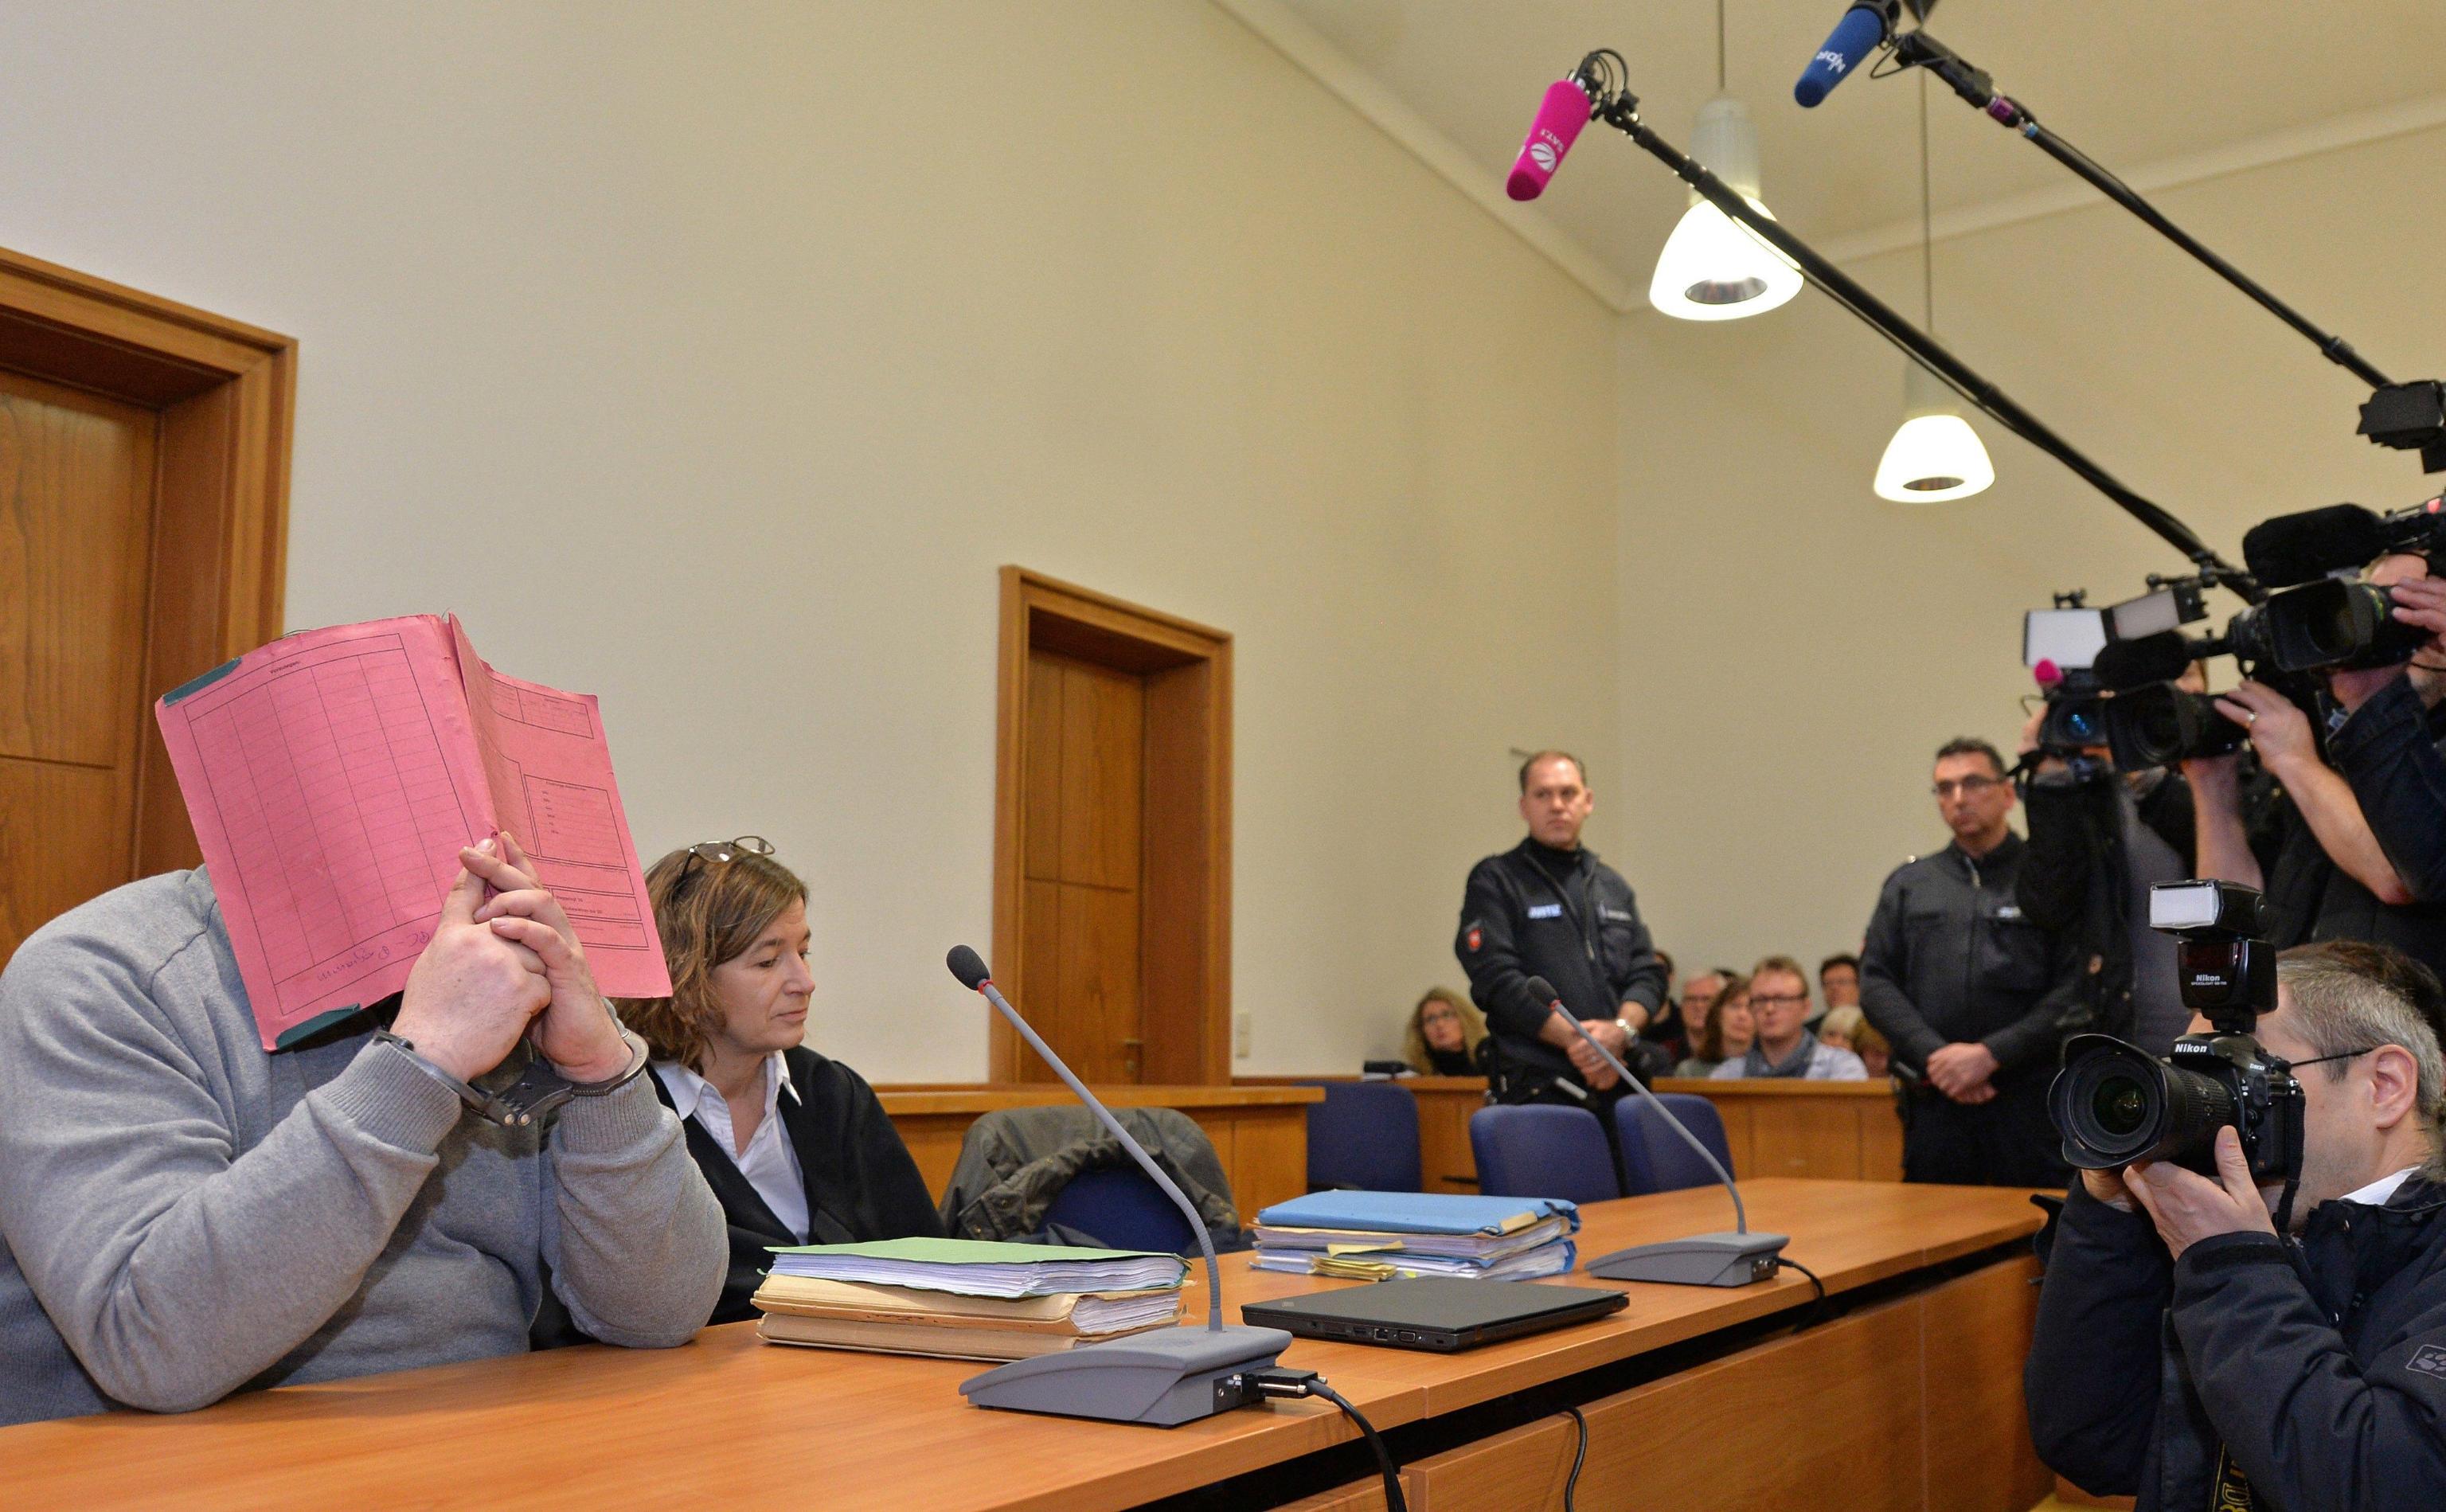 Germania: 'infermiere uccise 100 malati'